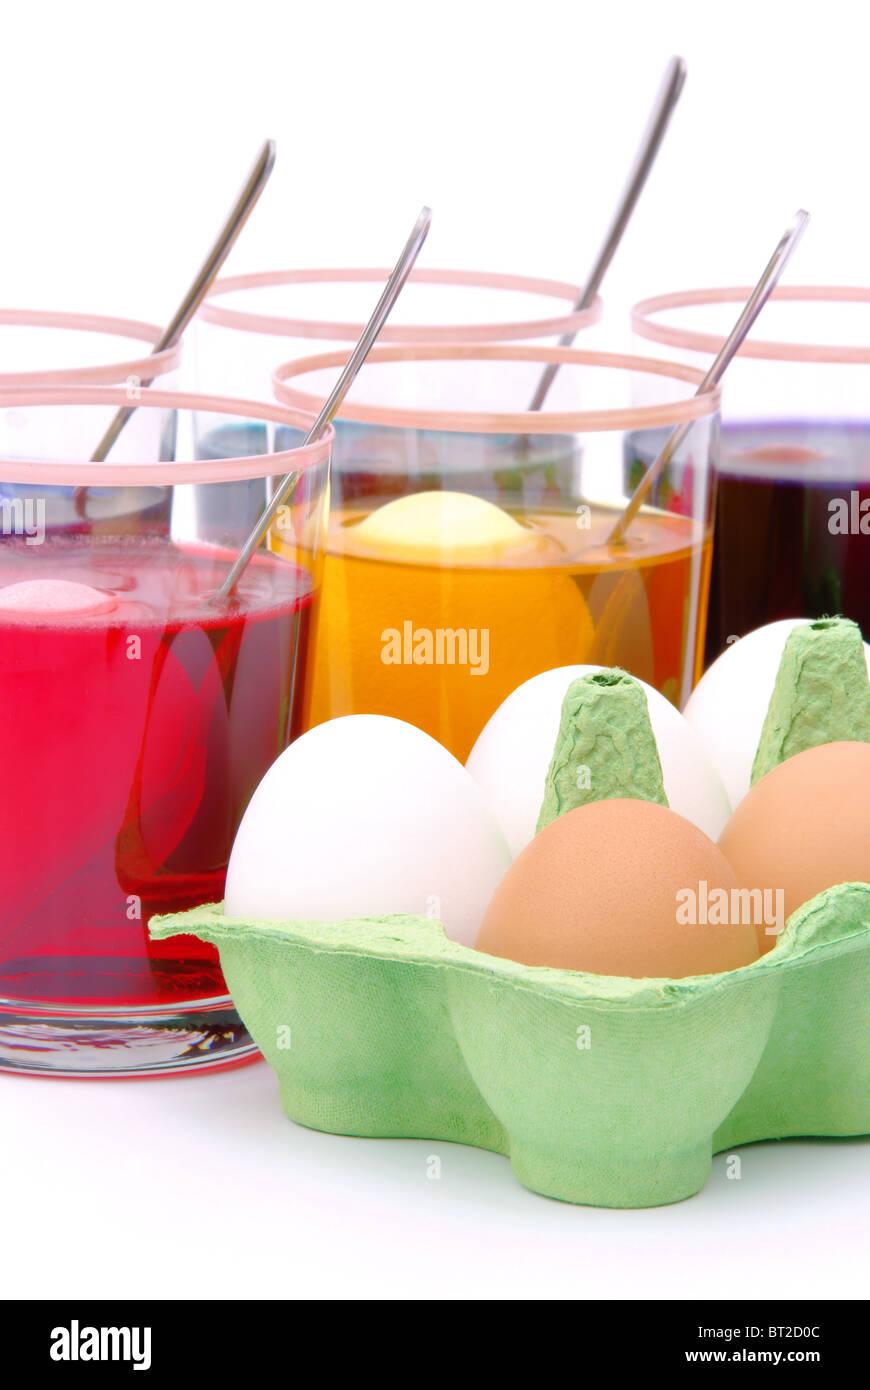 Ostereier Färben - Eiern Ostern Farbe 05 Stockbild